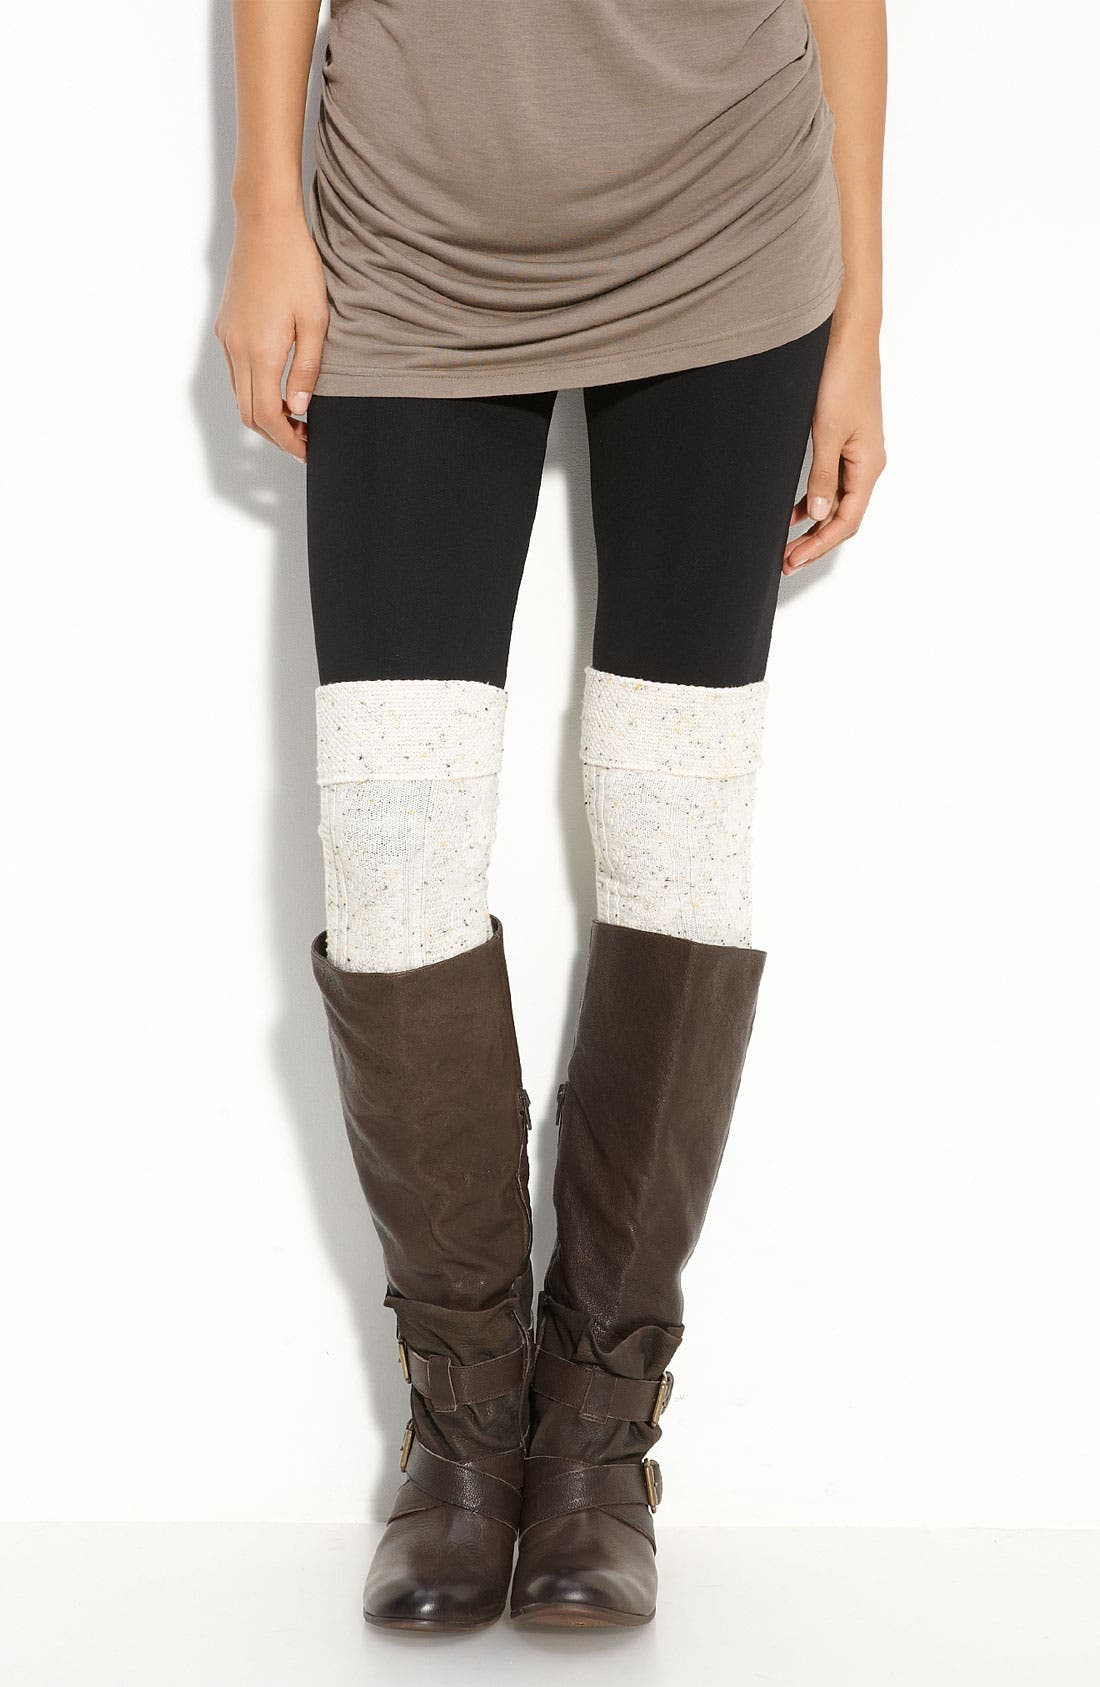 Alternate Image 1 Selected - Nordstrom Textured Over the Knee Socks